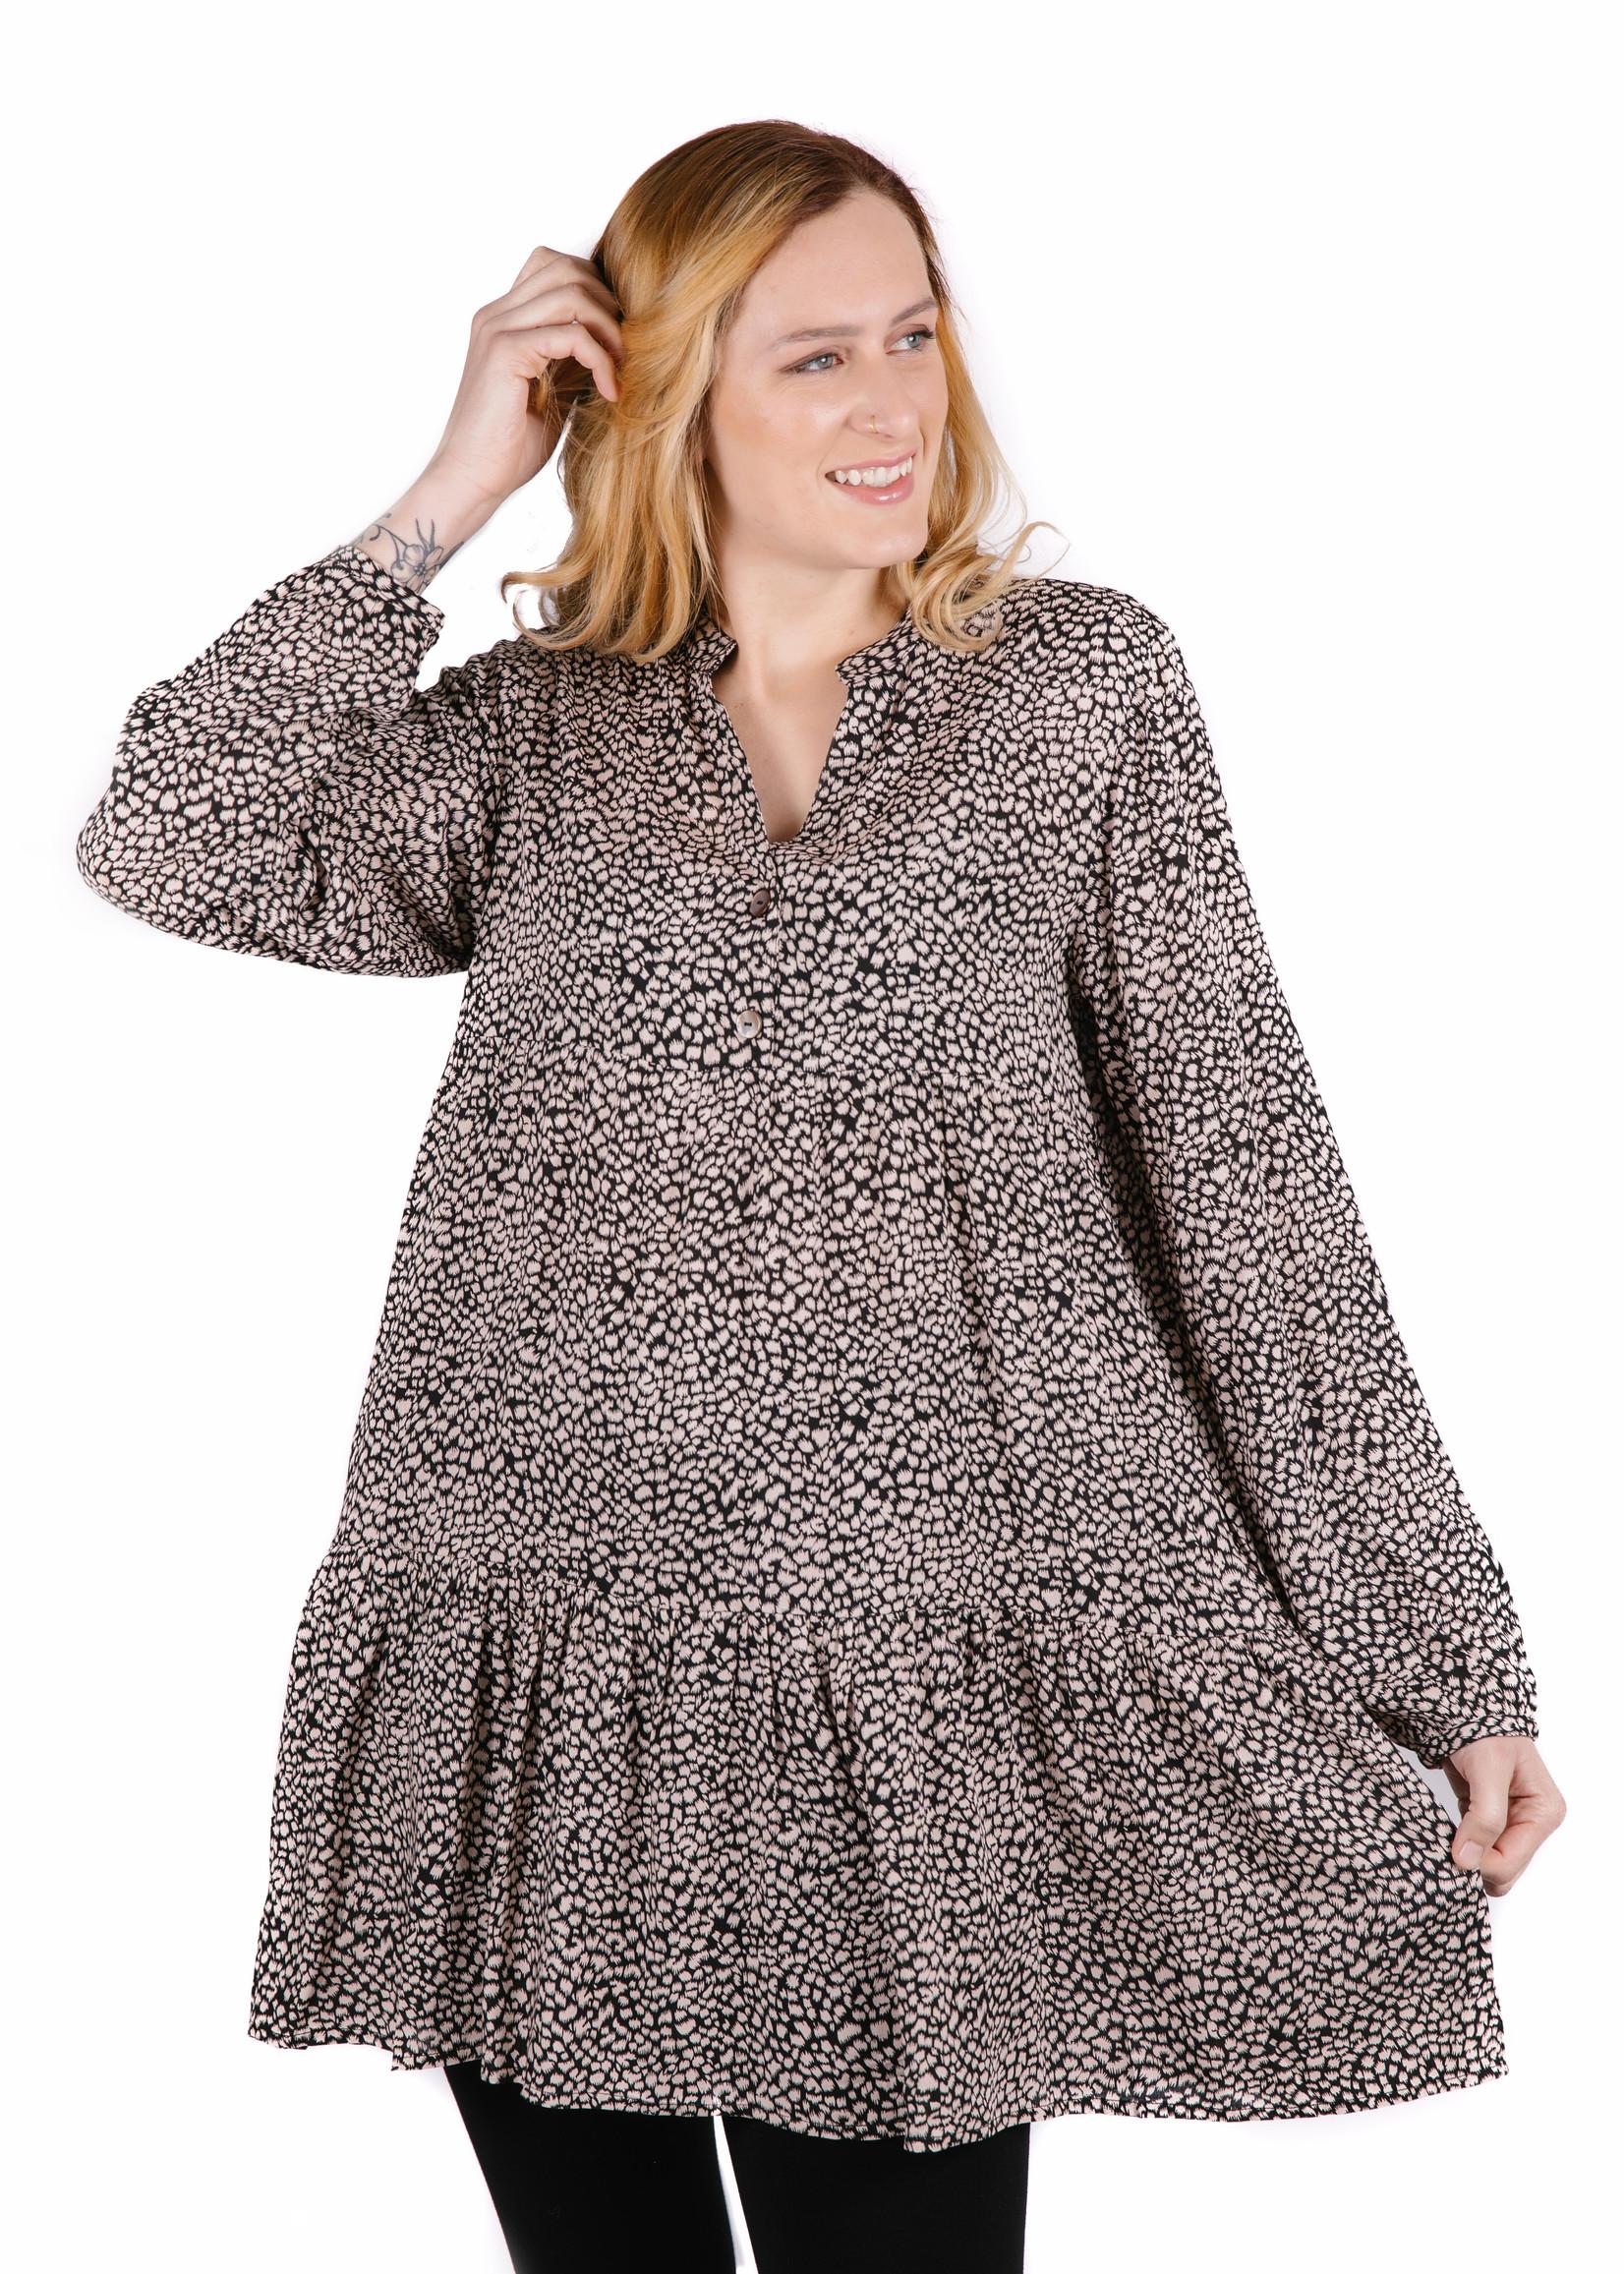 Shannon Passero Shannon Passero Julia Tunic Dress